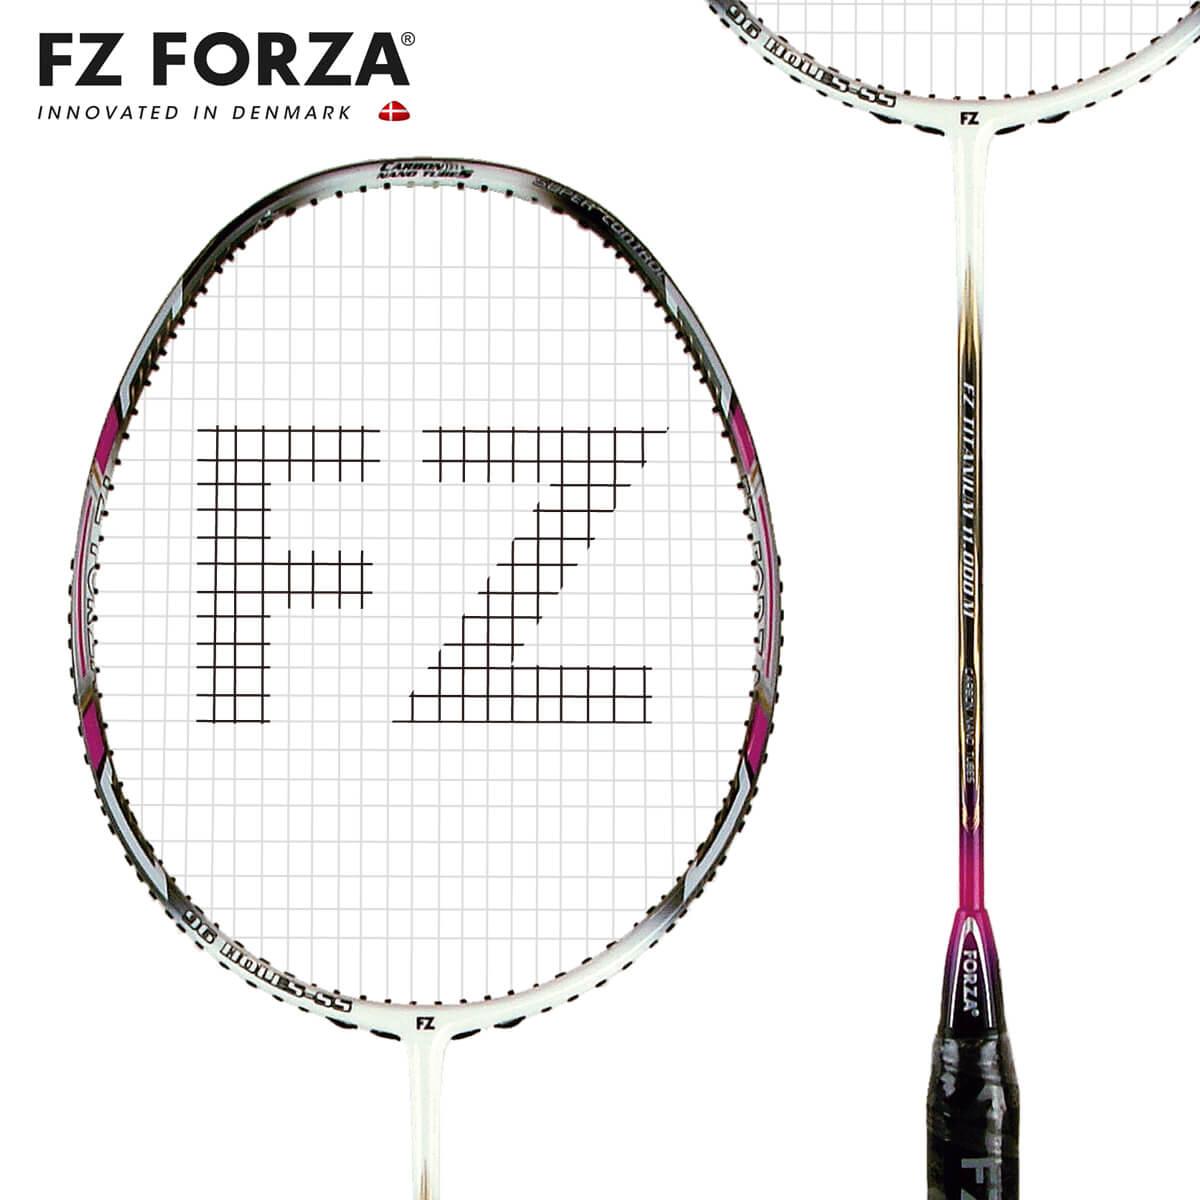 FZ FORZA Ti.11000 M 96ホール FORZA FZ フォーザ FZ M バドミントンラケット【オススメガット&ガット張り工賃無料】, 練馬区:bb023f91 --- officewill.xsrv.jp